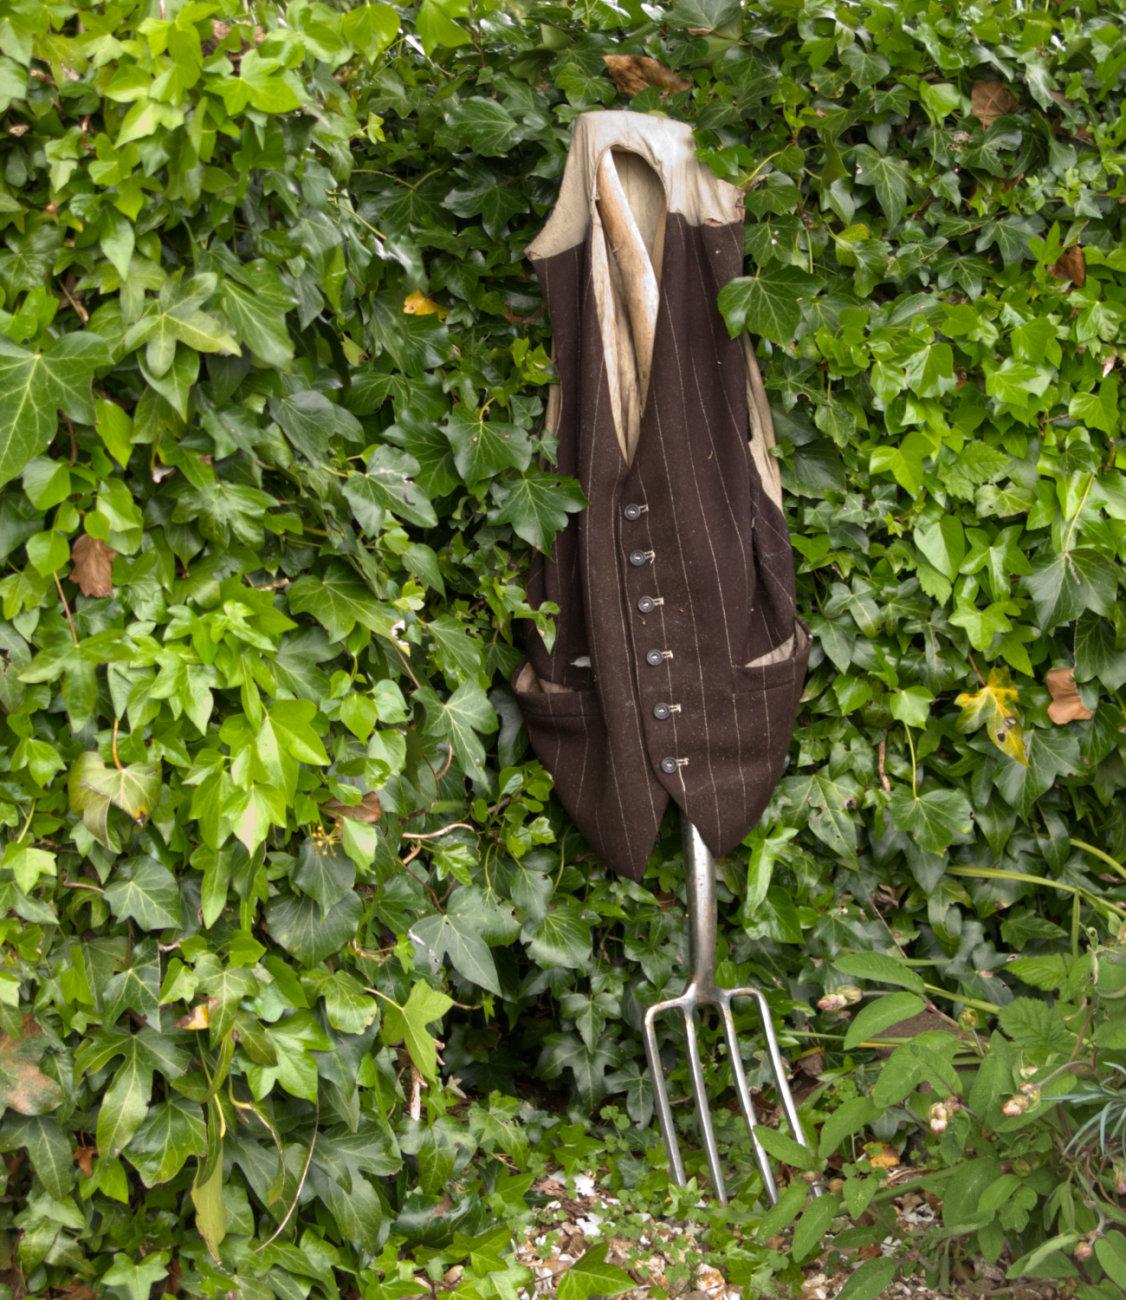 waistcoat and fork